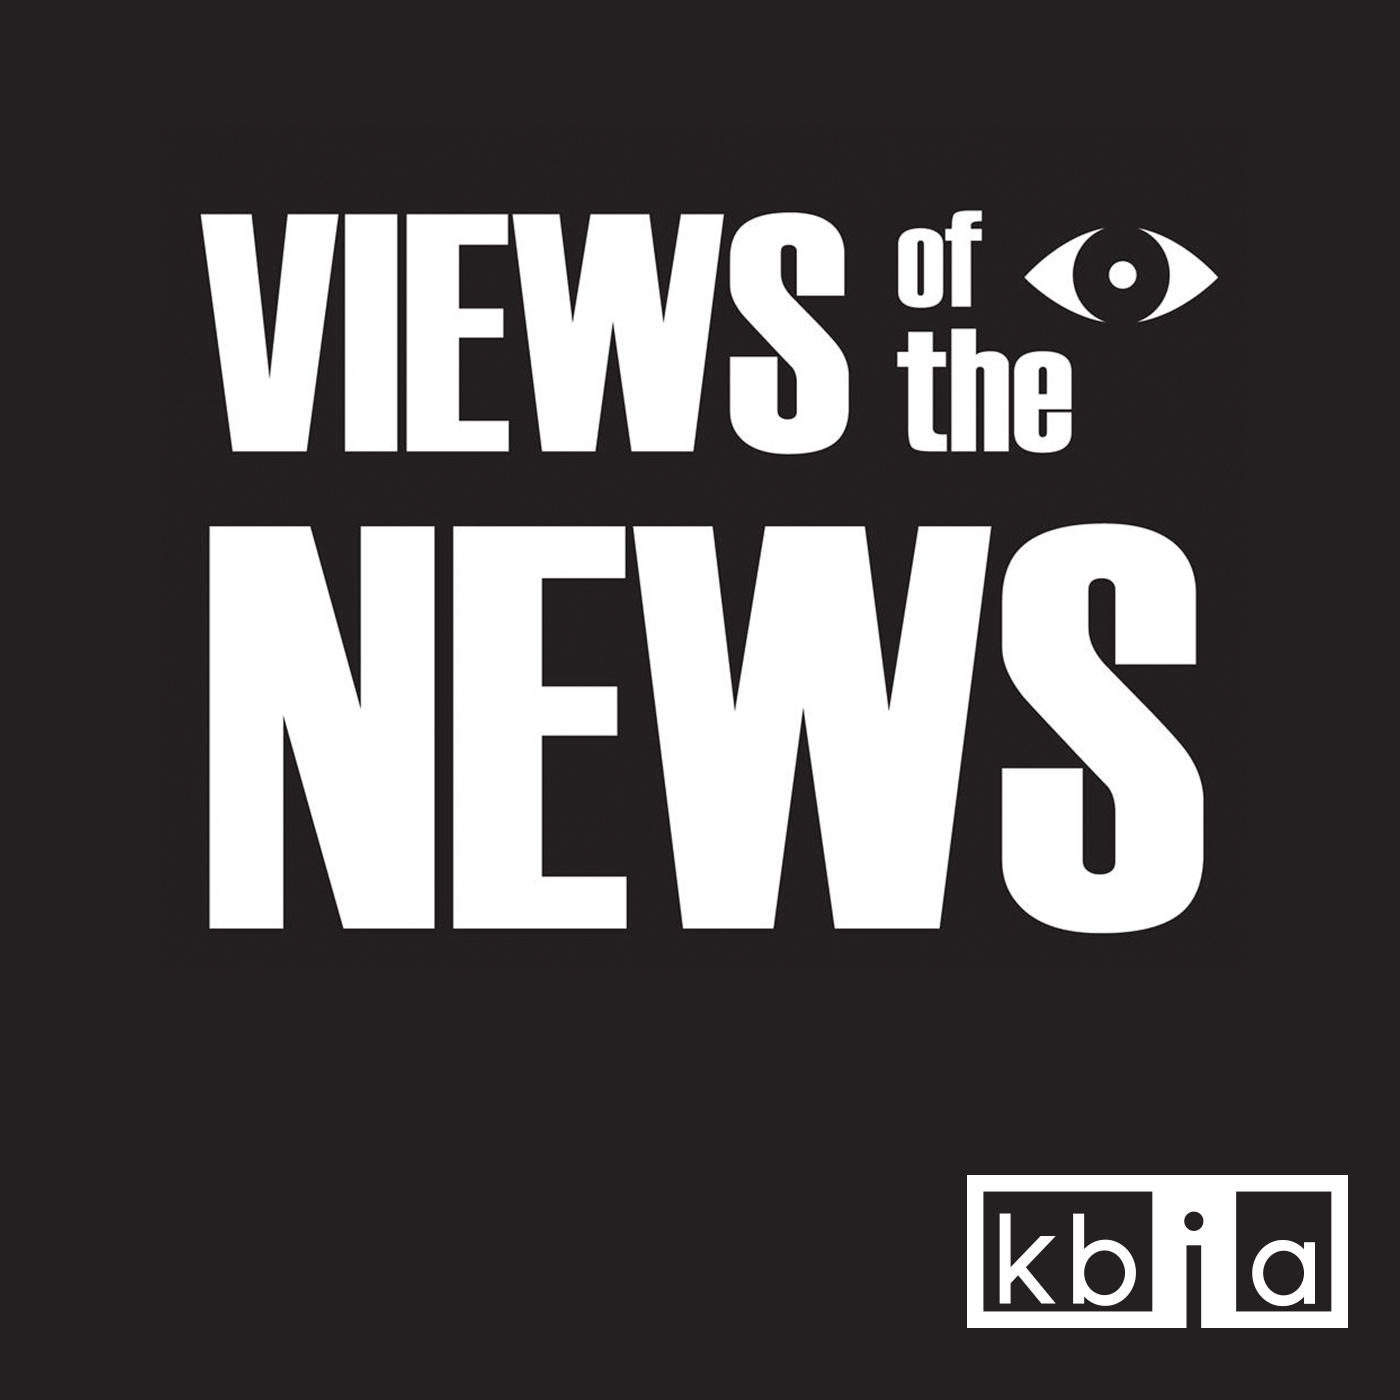 Views of the News album art.